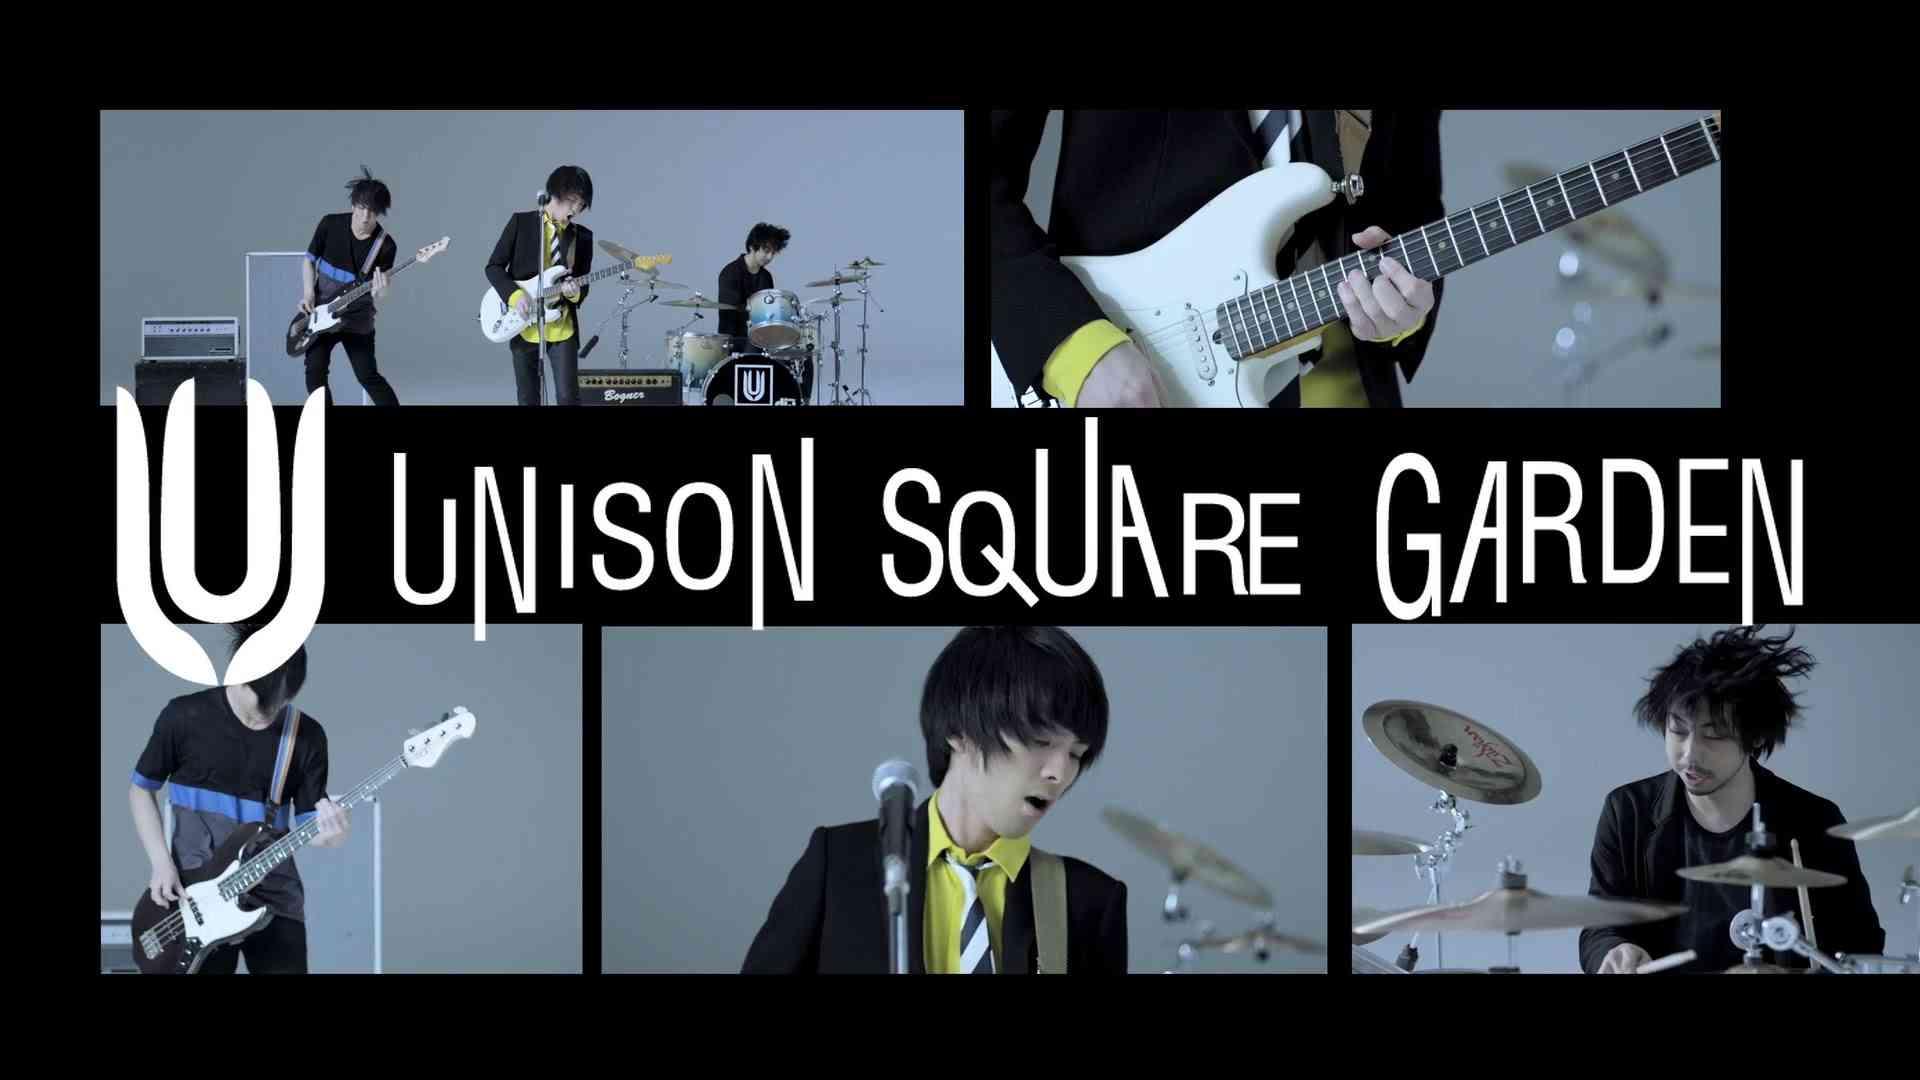 UNISON SQUARE GARDEN「シュガーソングとビターステップ」ショートVer. - YouTube